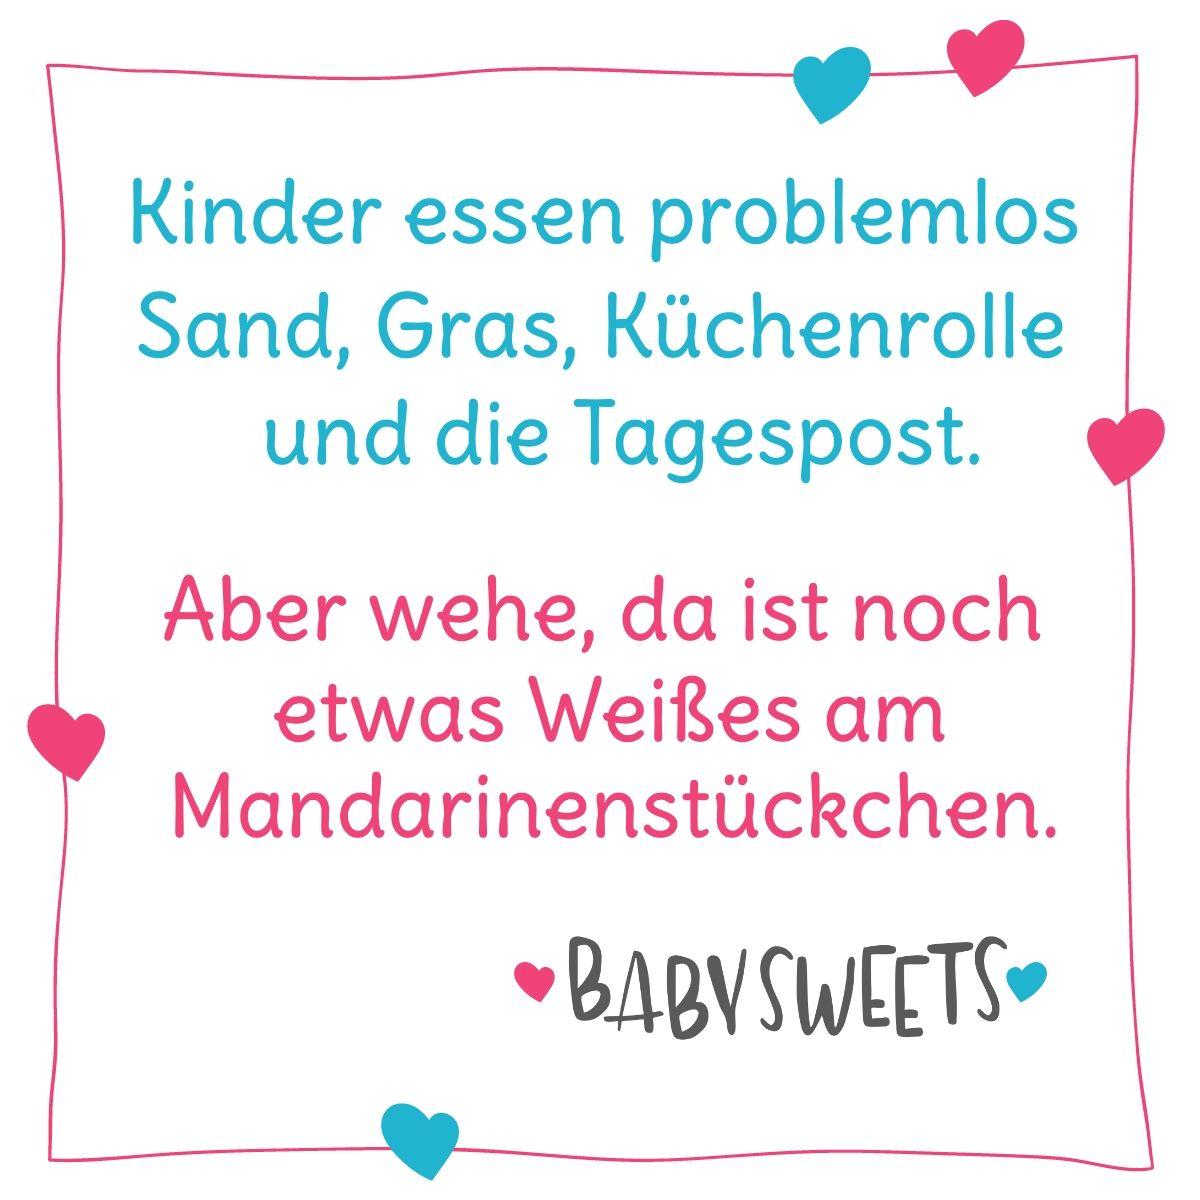 Baby Sweets Sprüche